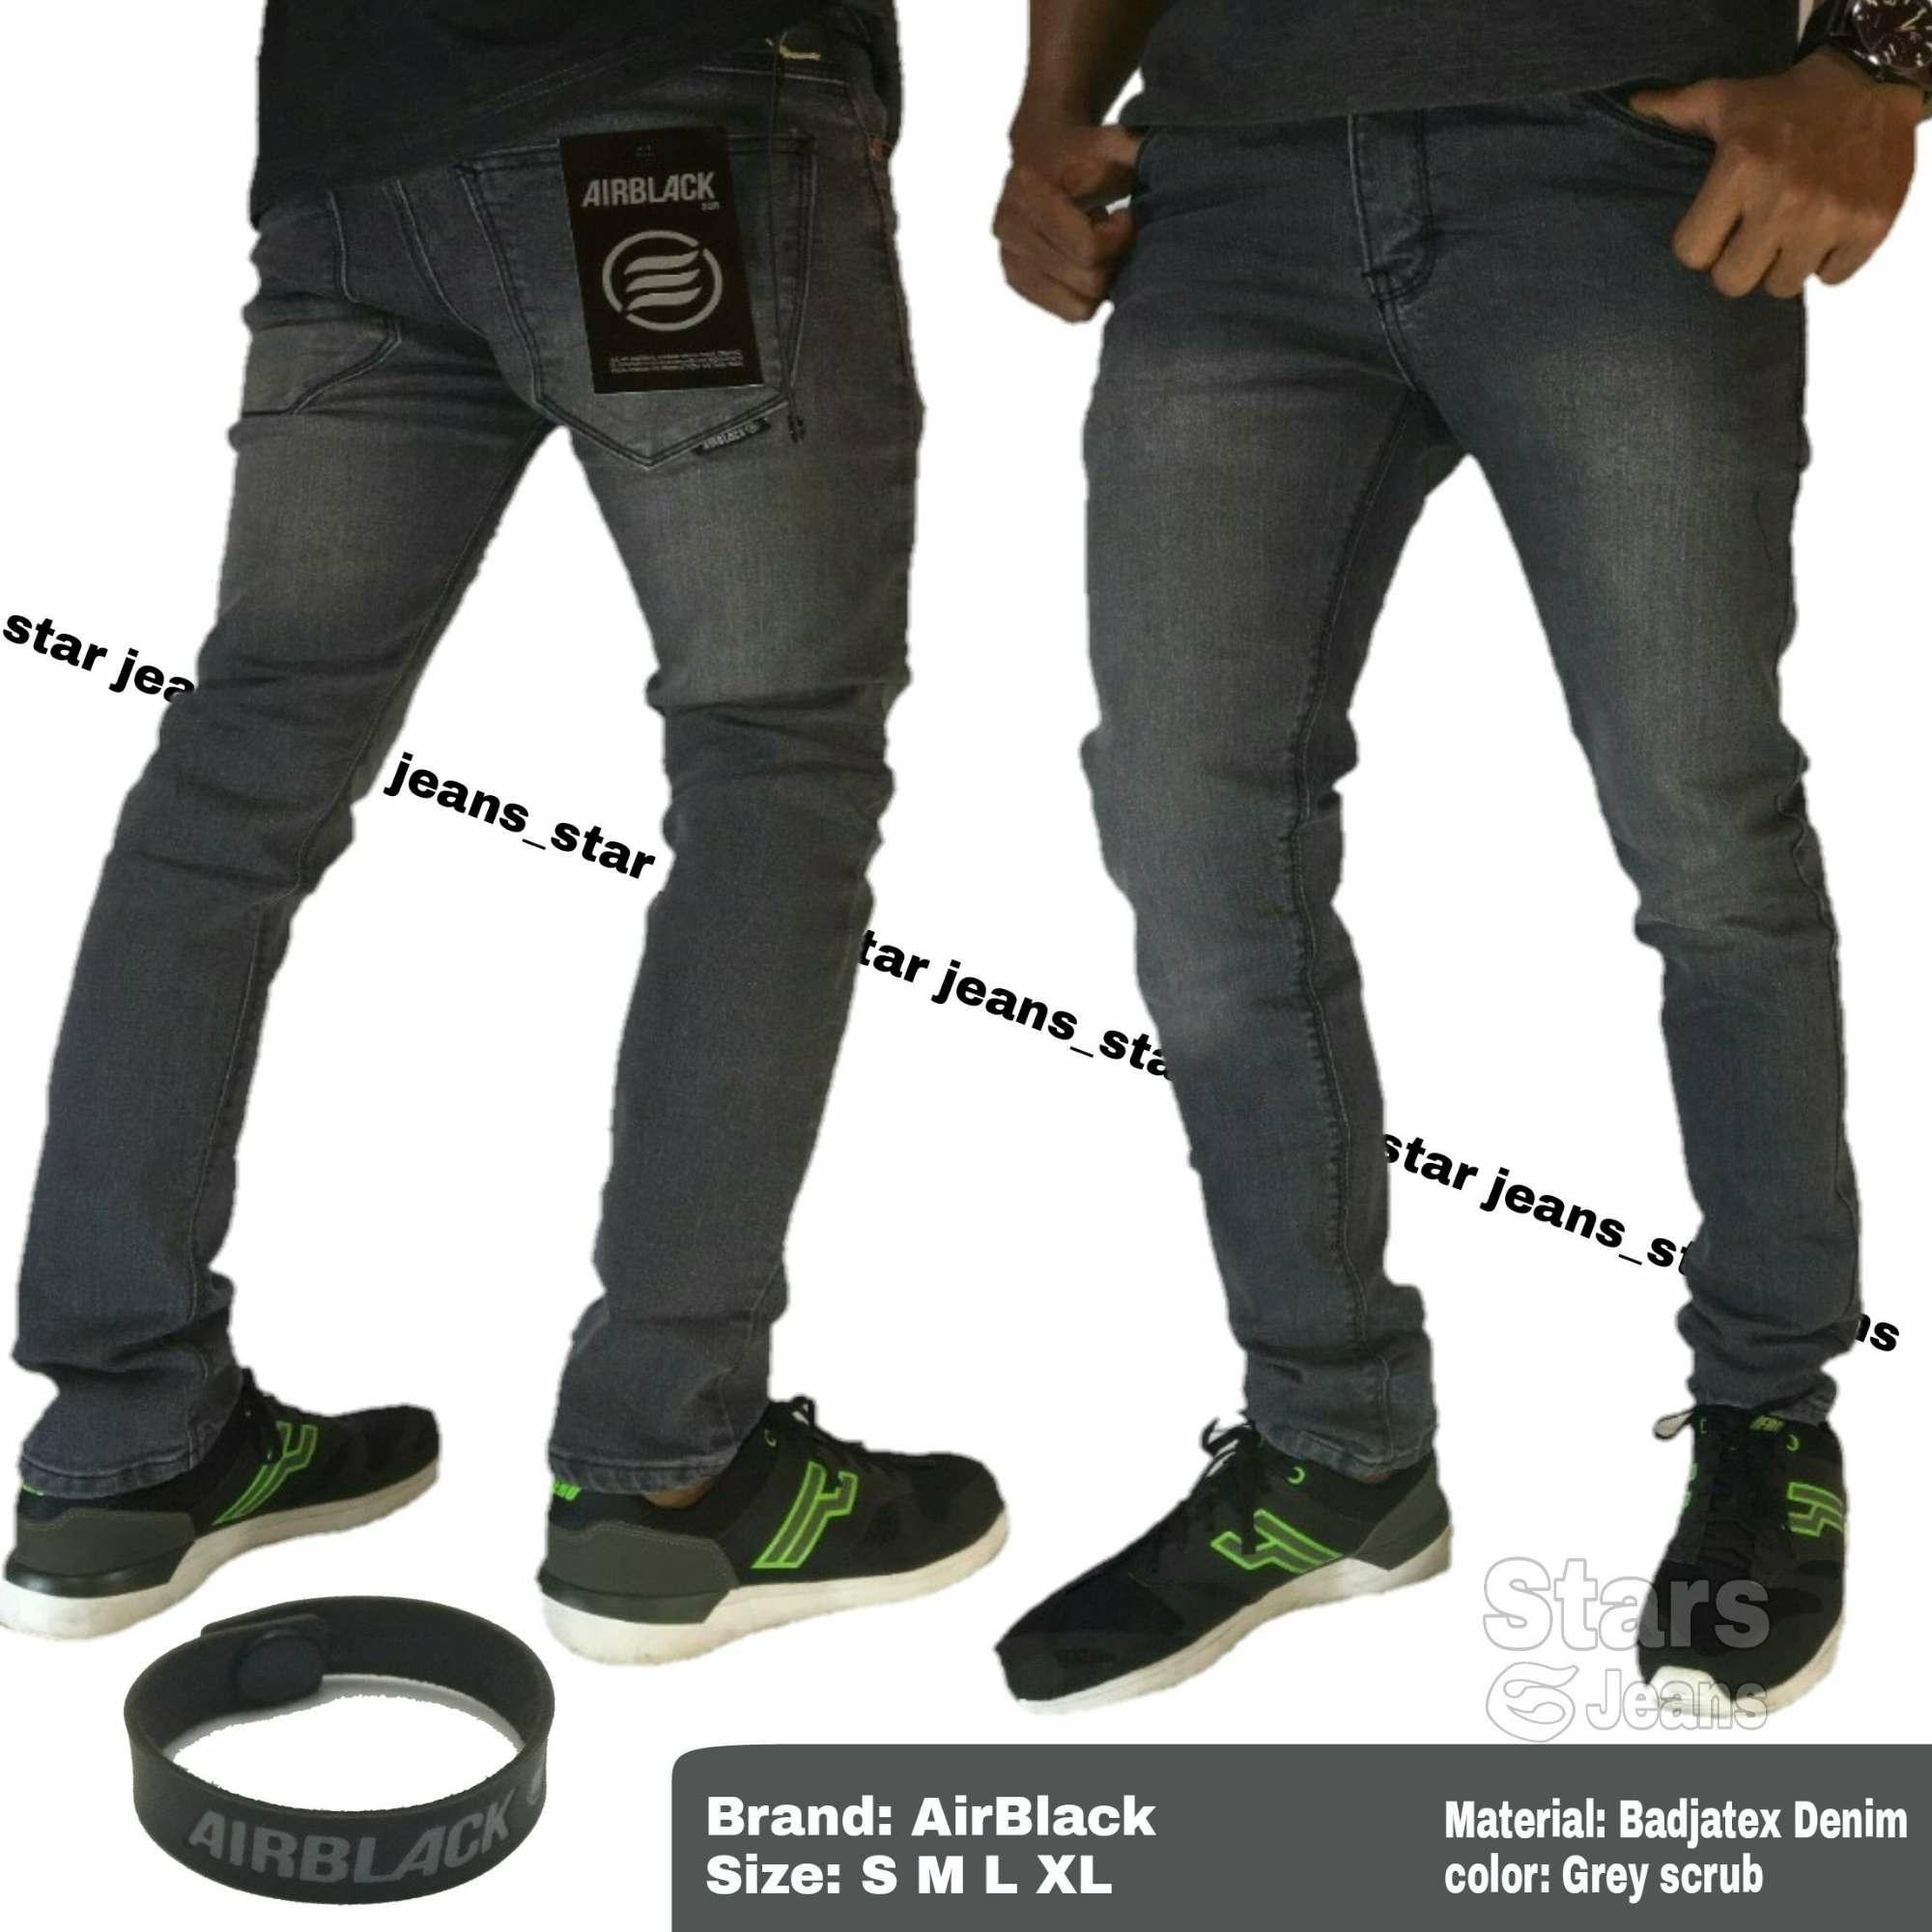 Sw Celana Jeans Pria Panjang Drakblue - Daftar Harga Terlengkap ... 609a15aaa7